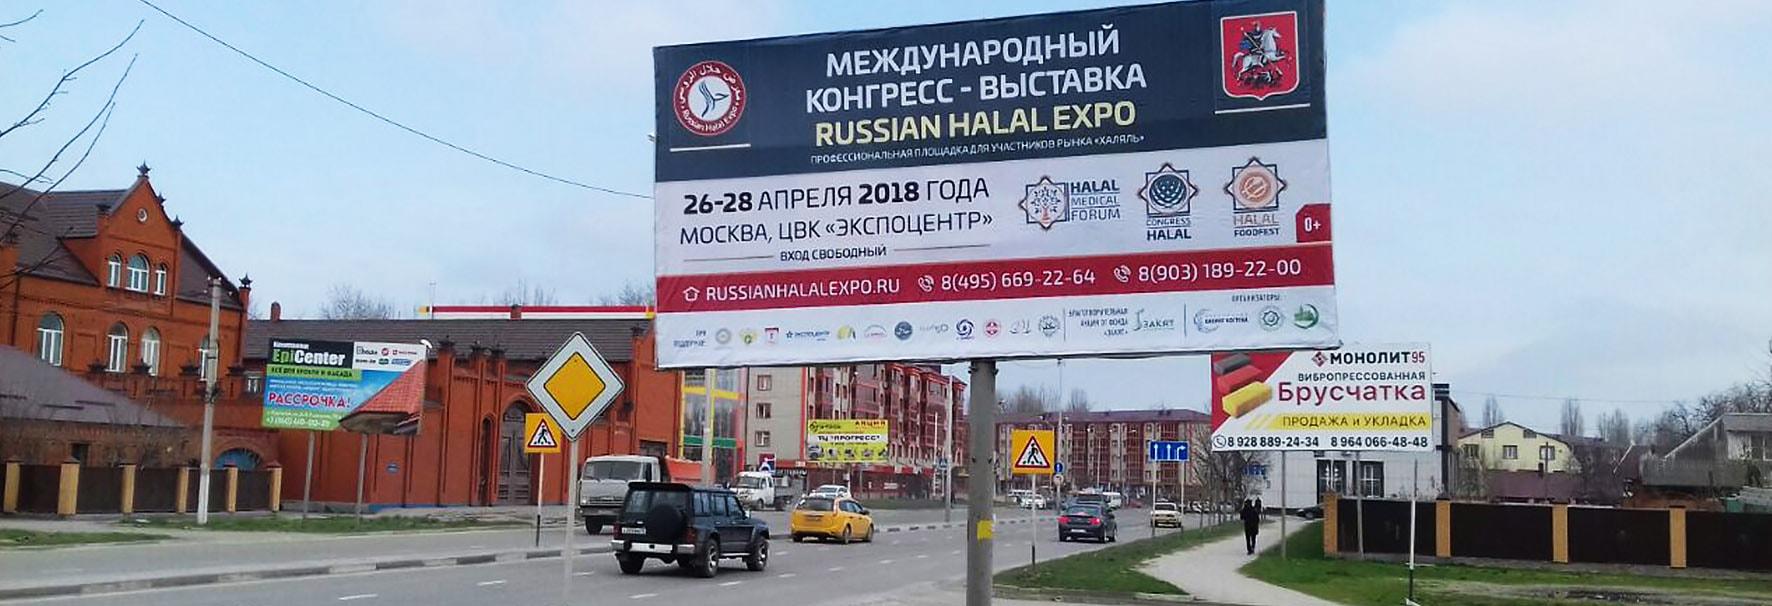 Реклама на билбордах в Грозном Russian Halal Expo